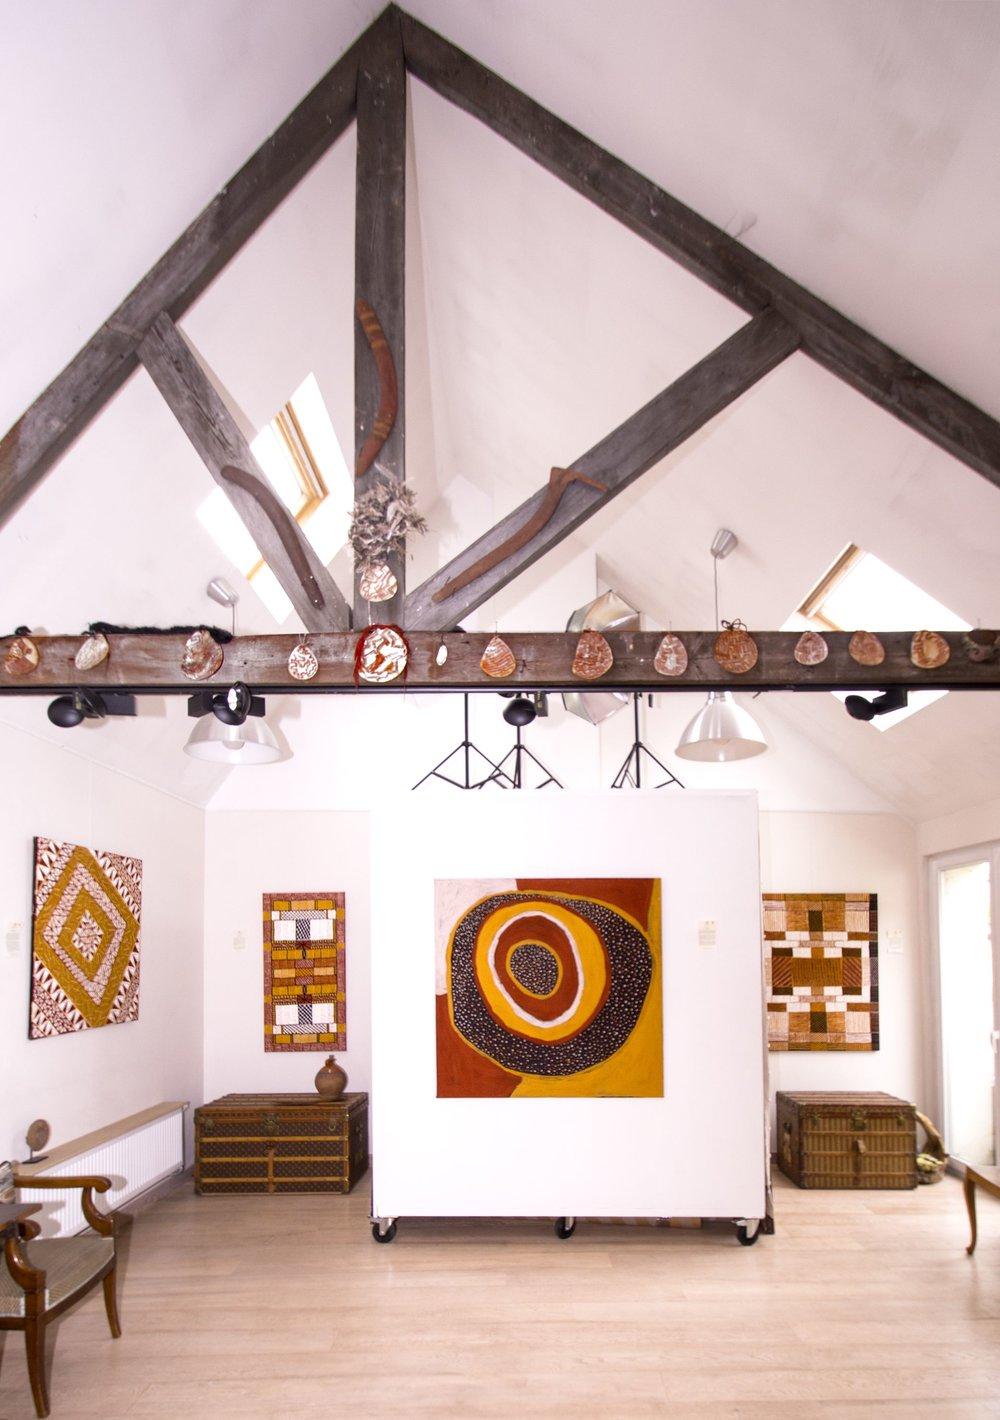 "Exposition d'art Aborigène ""One Island One side"" avec les artistes des Iles Tiwi,  à Bruxelles jusqu'au 2 juin 2018. De gauche à droite, œuvres des artistes Alison Puruntatameri - Jilamara Design - 100 x 100 cm, Brian Farmer Illortaminni - Jilamara - 120 x 60 cm, Timothy Cook - Kulama ceremonies - 120 x 120 cm, Brian Farmer Illortaminni - Jilamara - 120 x 90cm."